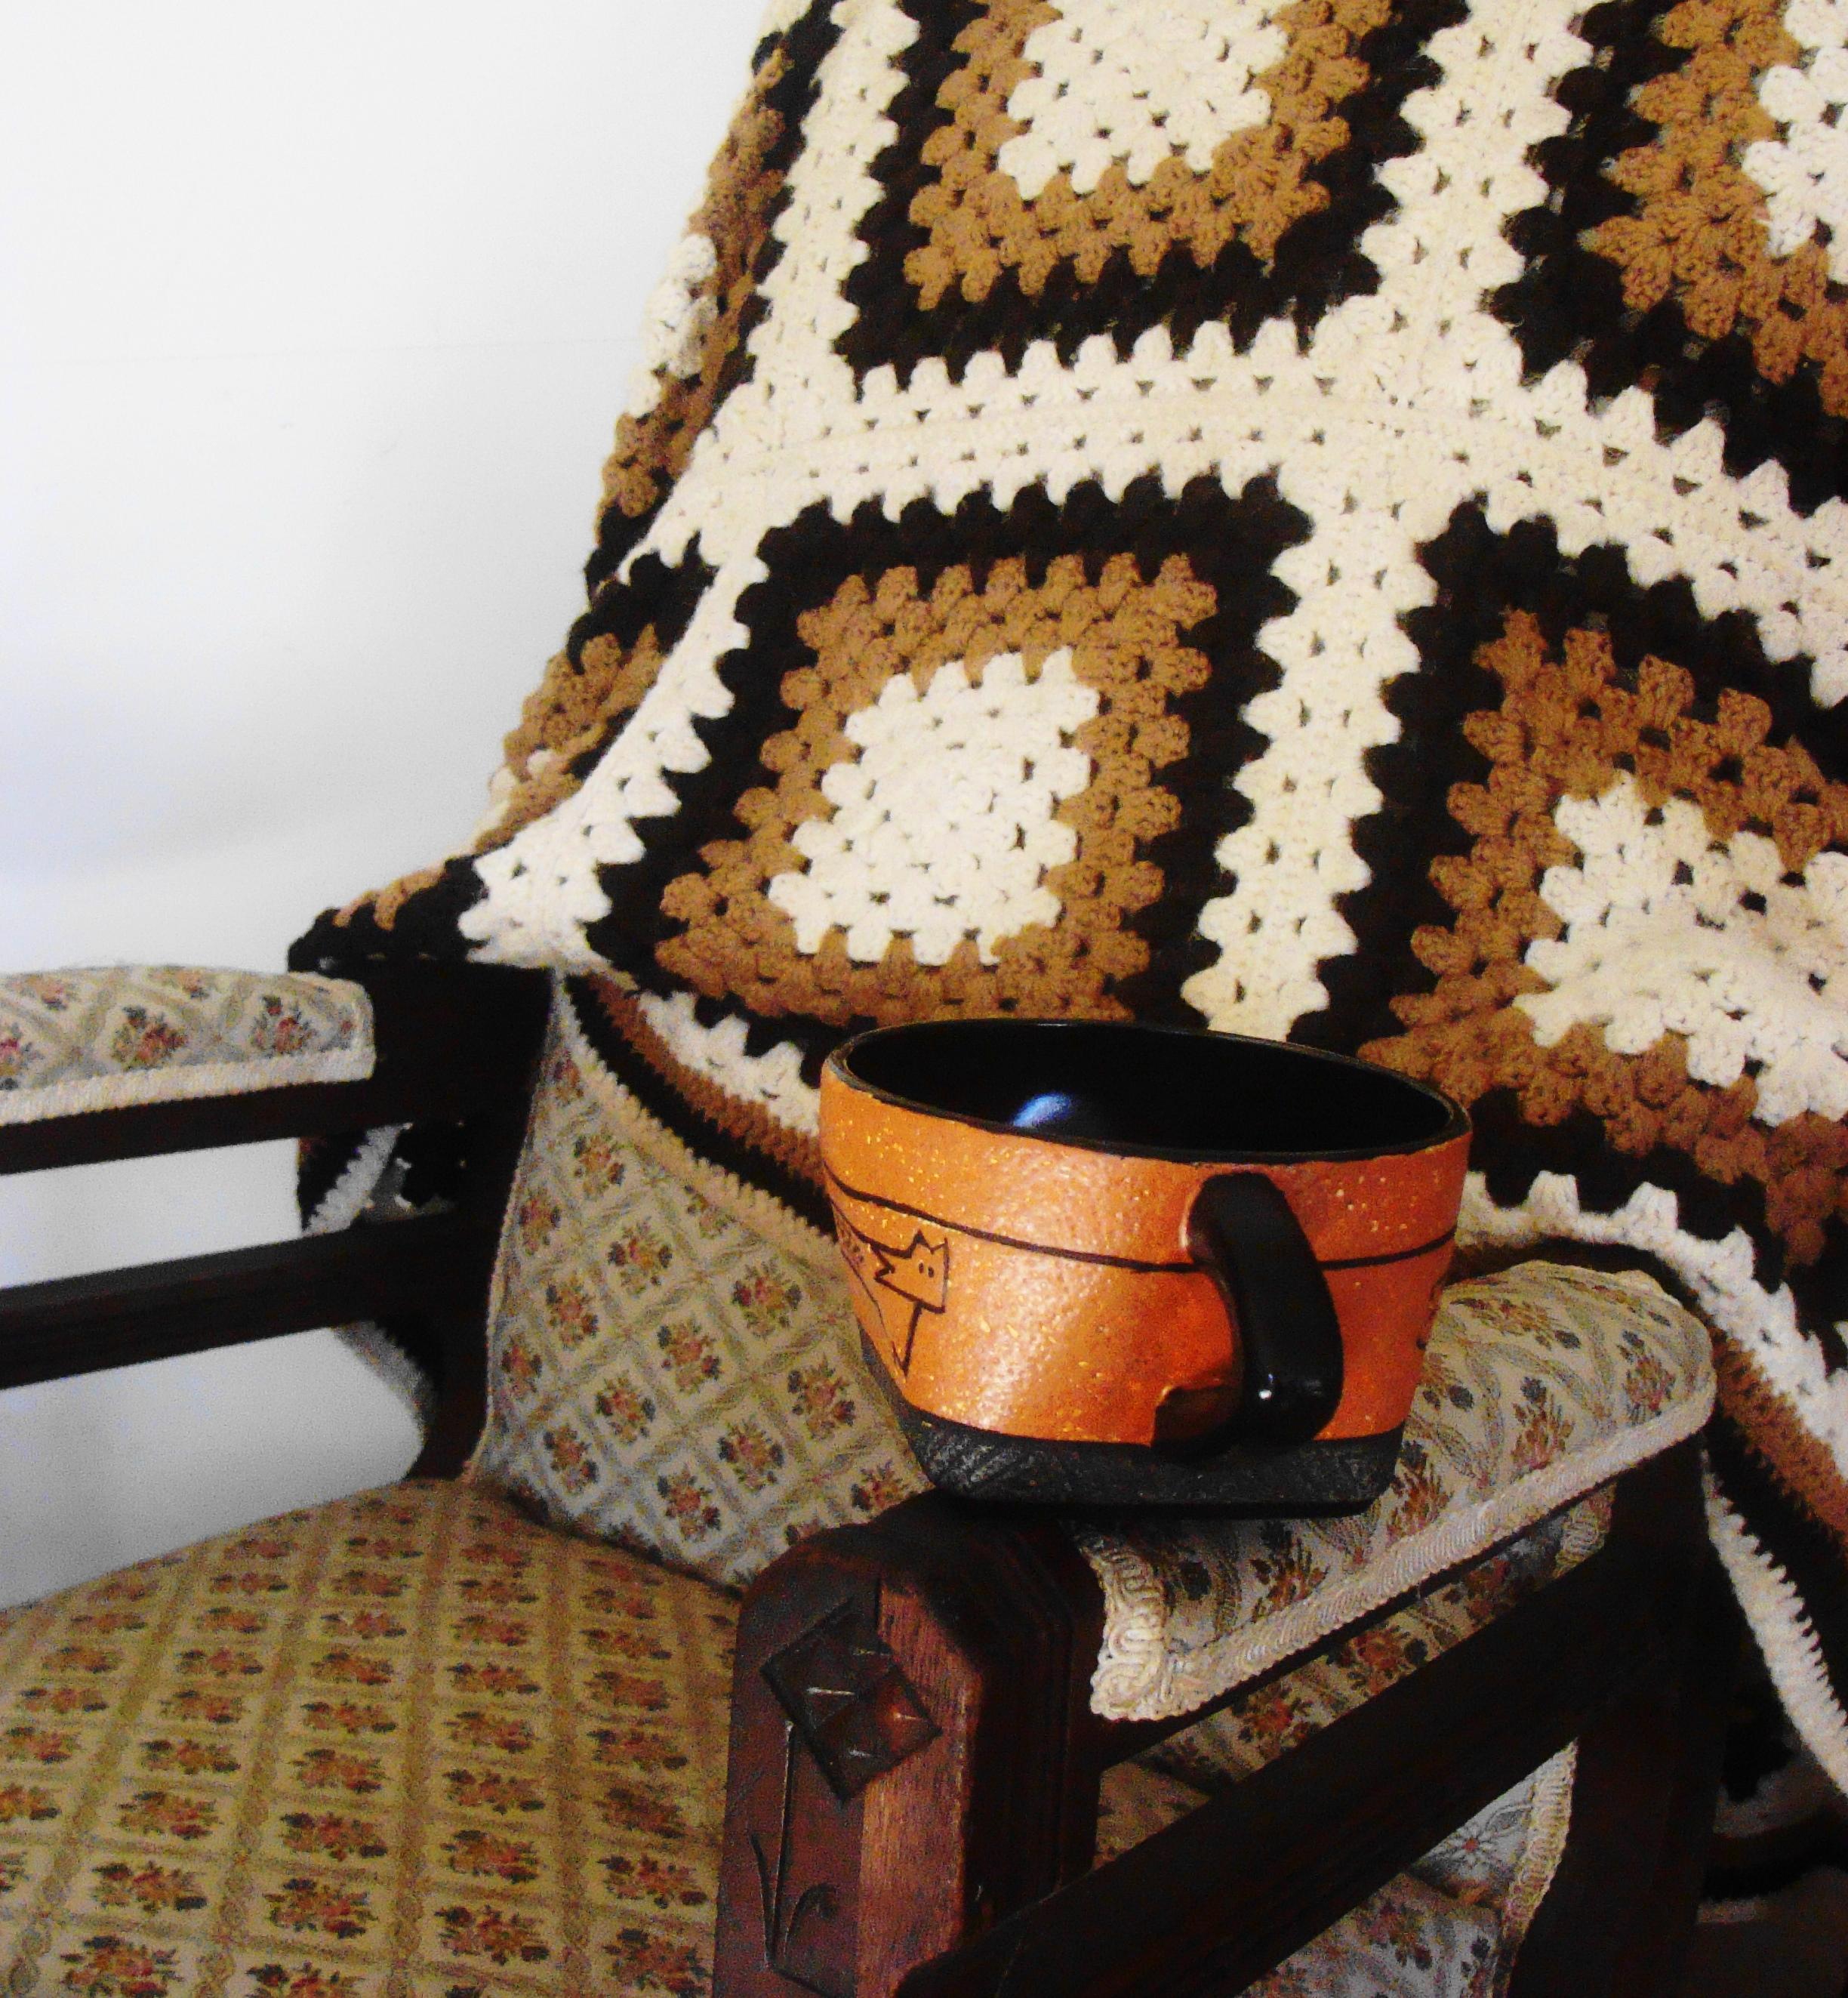 Tea often demands a good book and a comfortable rocking chair.